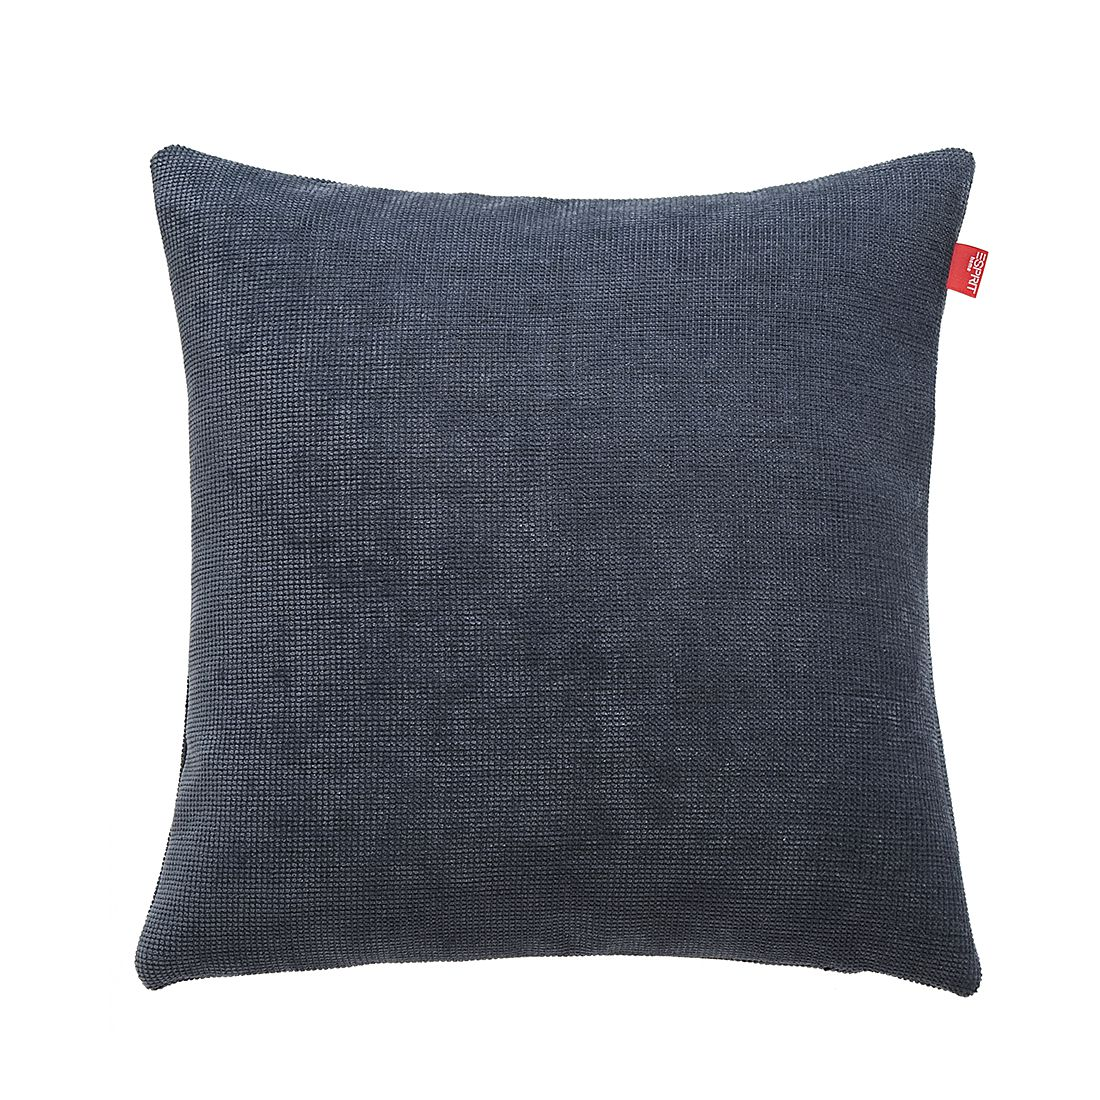 Kissenhülle E-Base – Blau – Größe: 50 x 50 cm, Esprit Home günstig